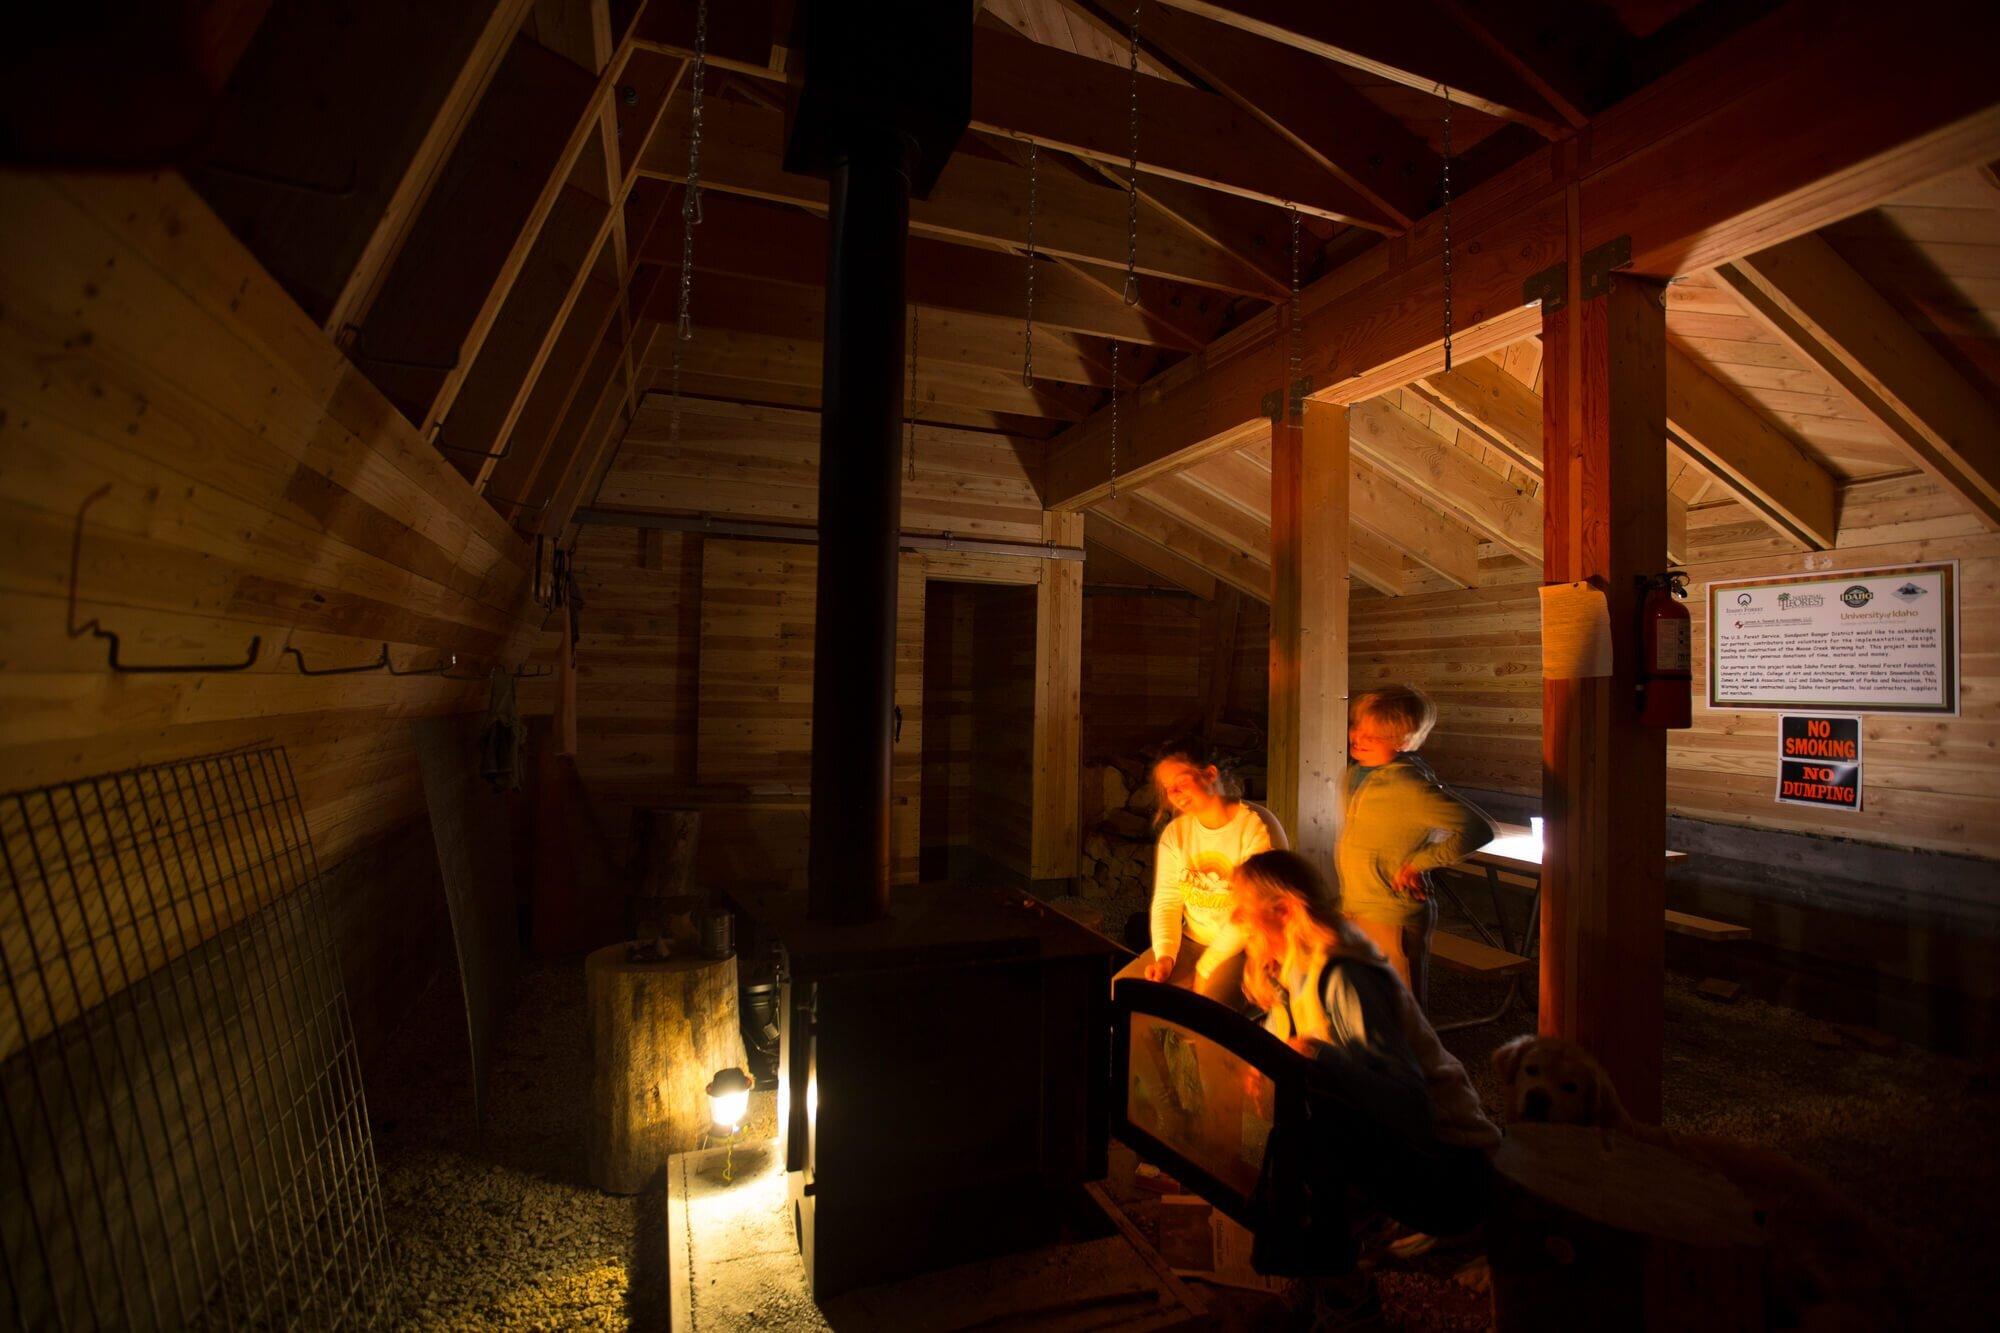 Moose-Creek-Warming-Hut-University-of-Idaho-Design-Build-Program-United-States-14